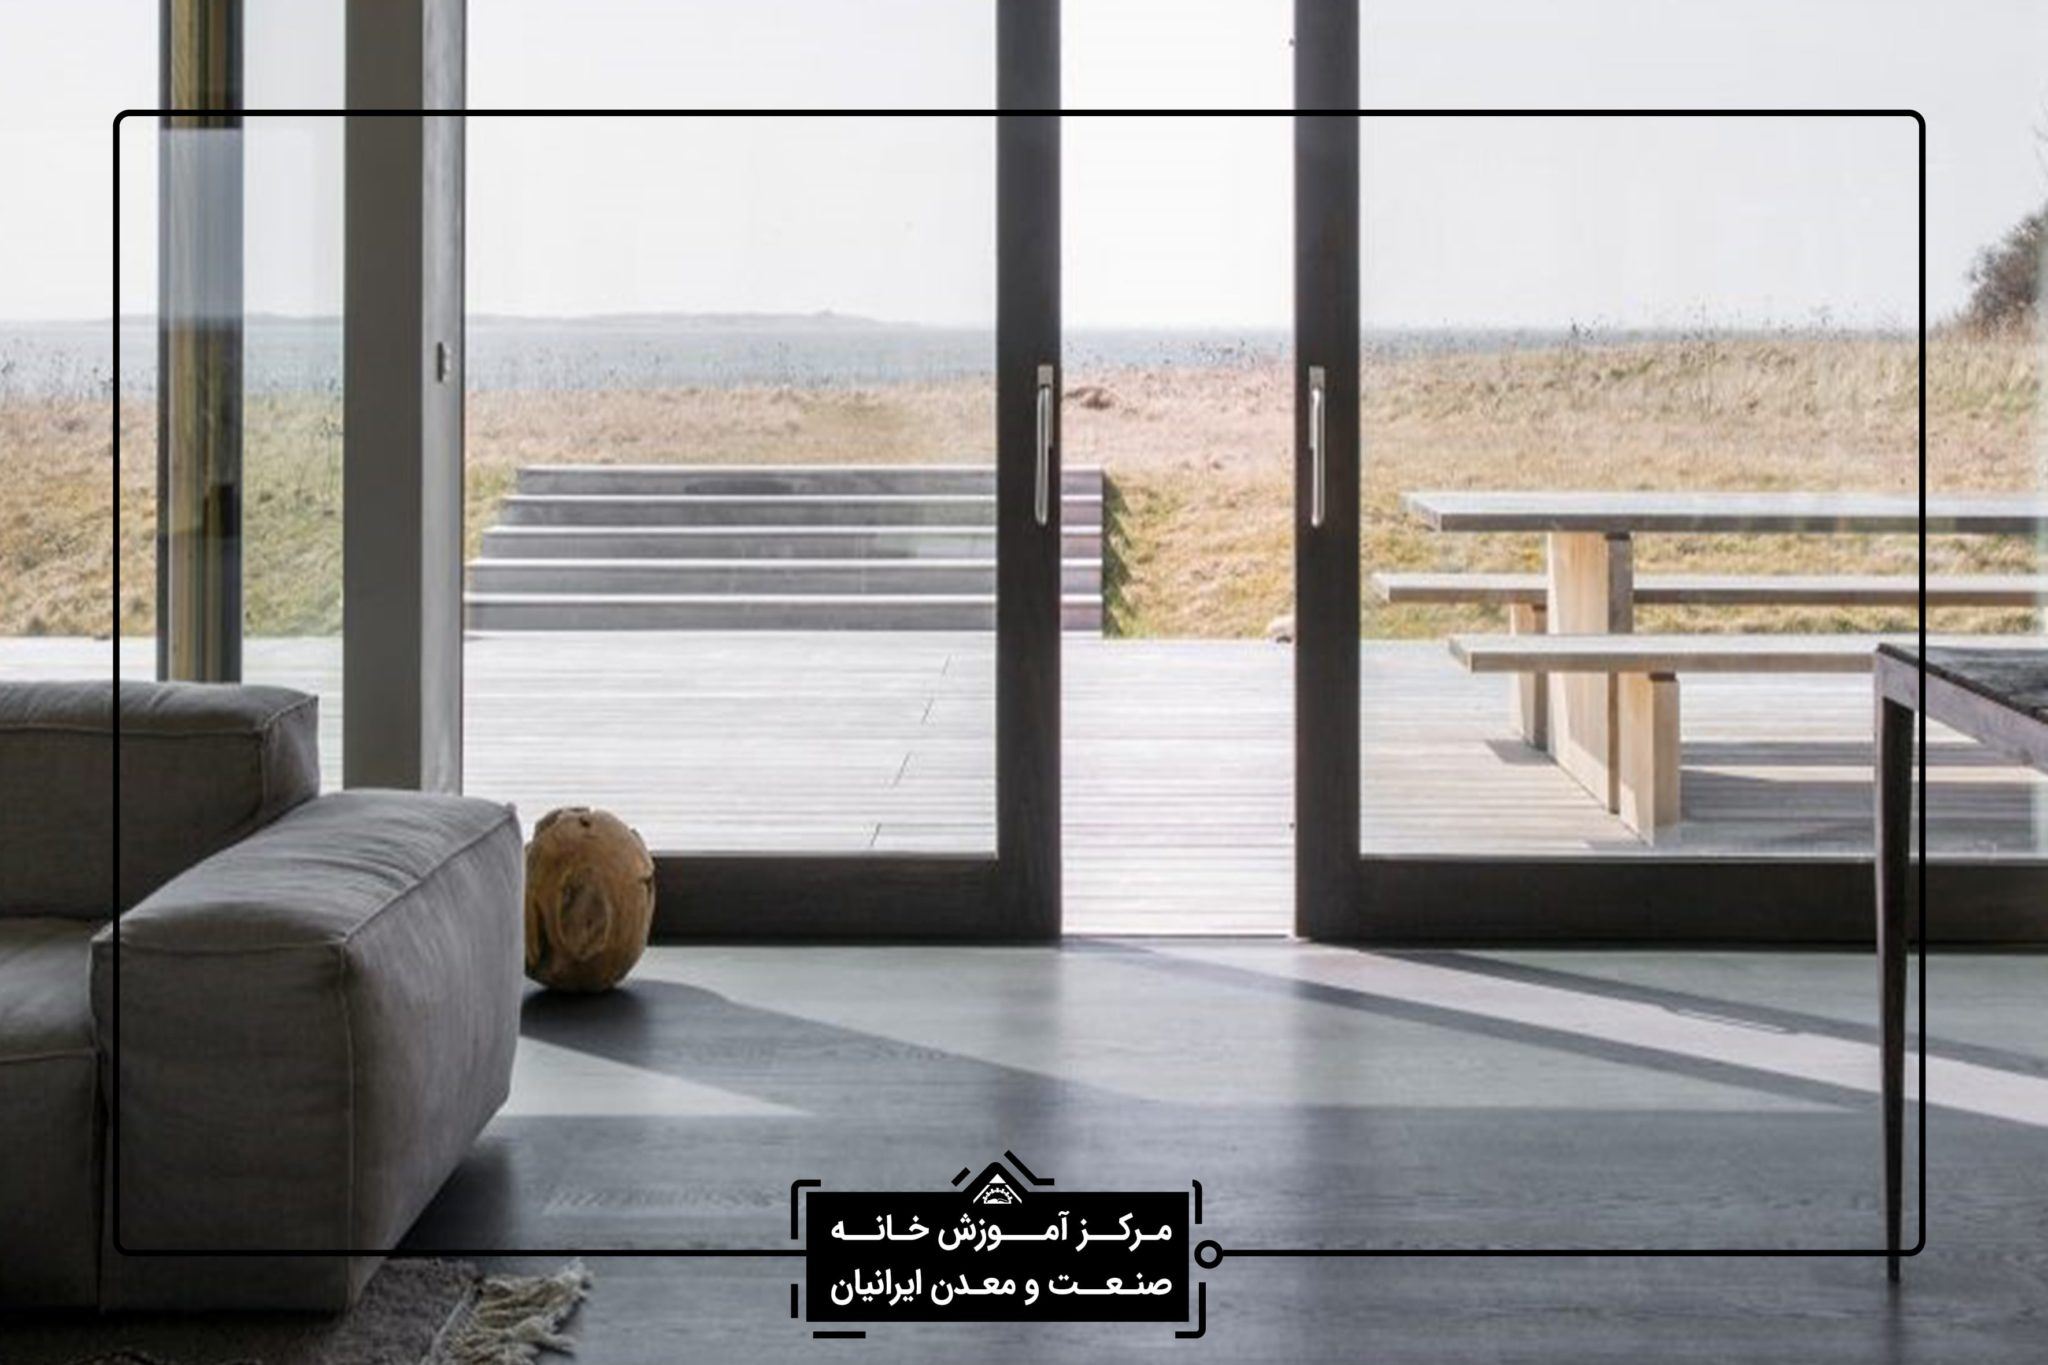 6 min 2 - معماری داخلی و دکوراسیون داخلی در شیراز